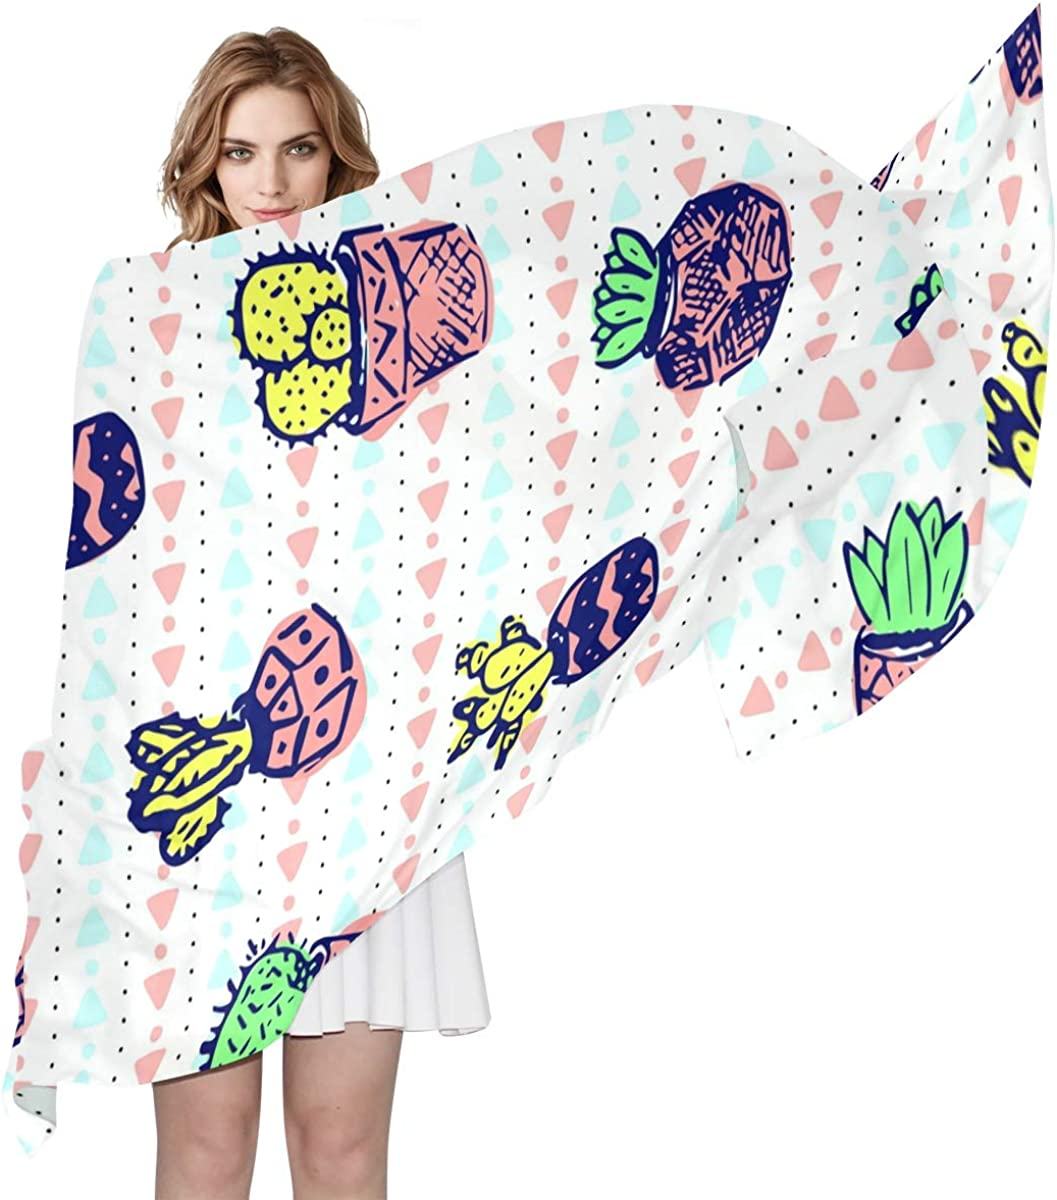 XLING Fashion Scarf Geometric Abstract Cactus Pattern Long Lightweight Sunscreen Scarf Shawl Wrap Muffler Neckerchief for Women Men